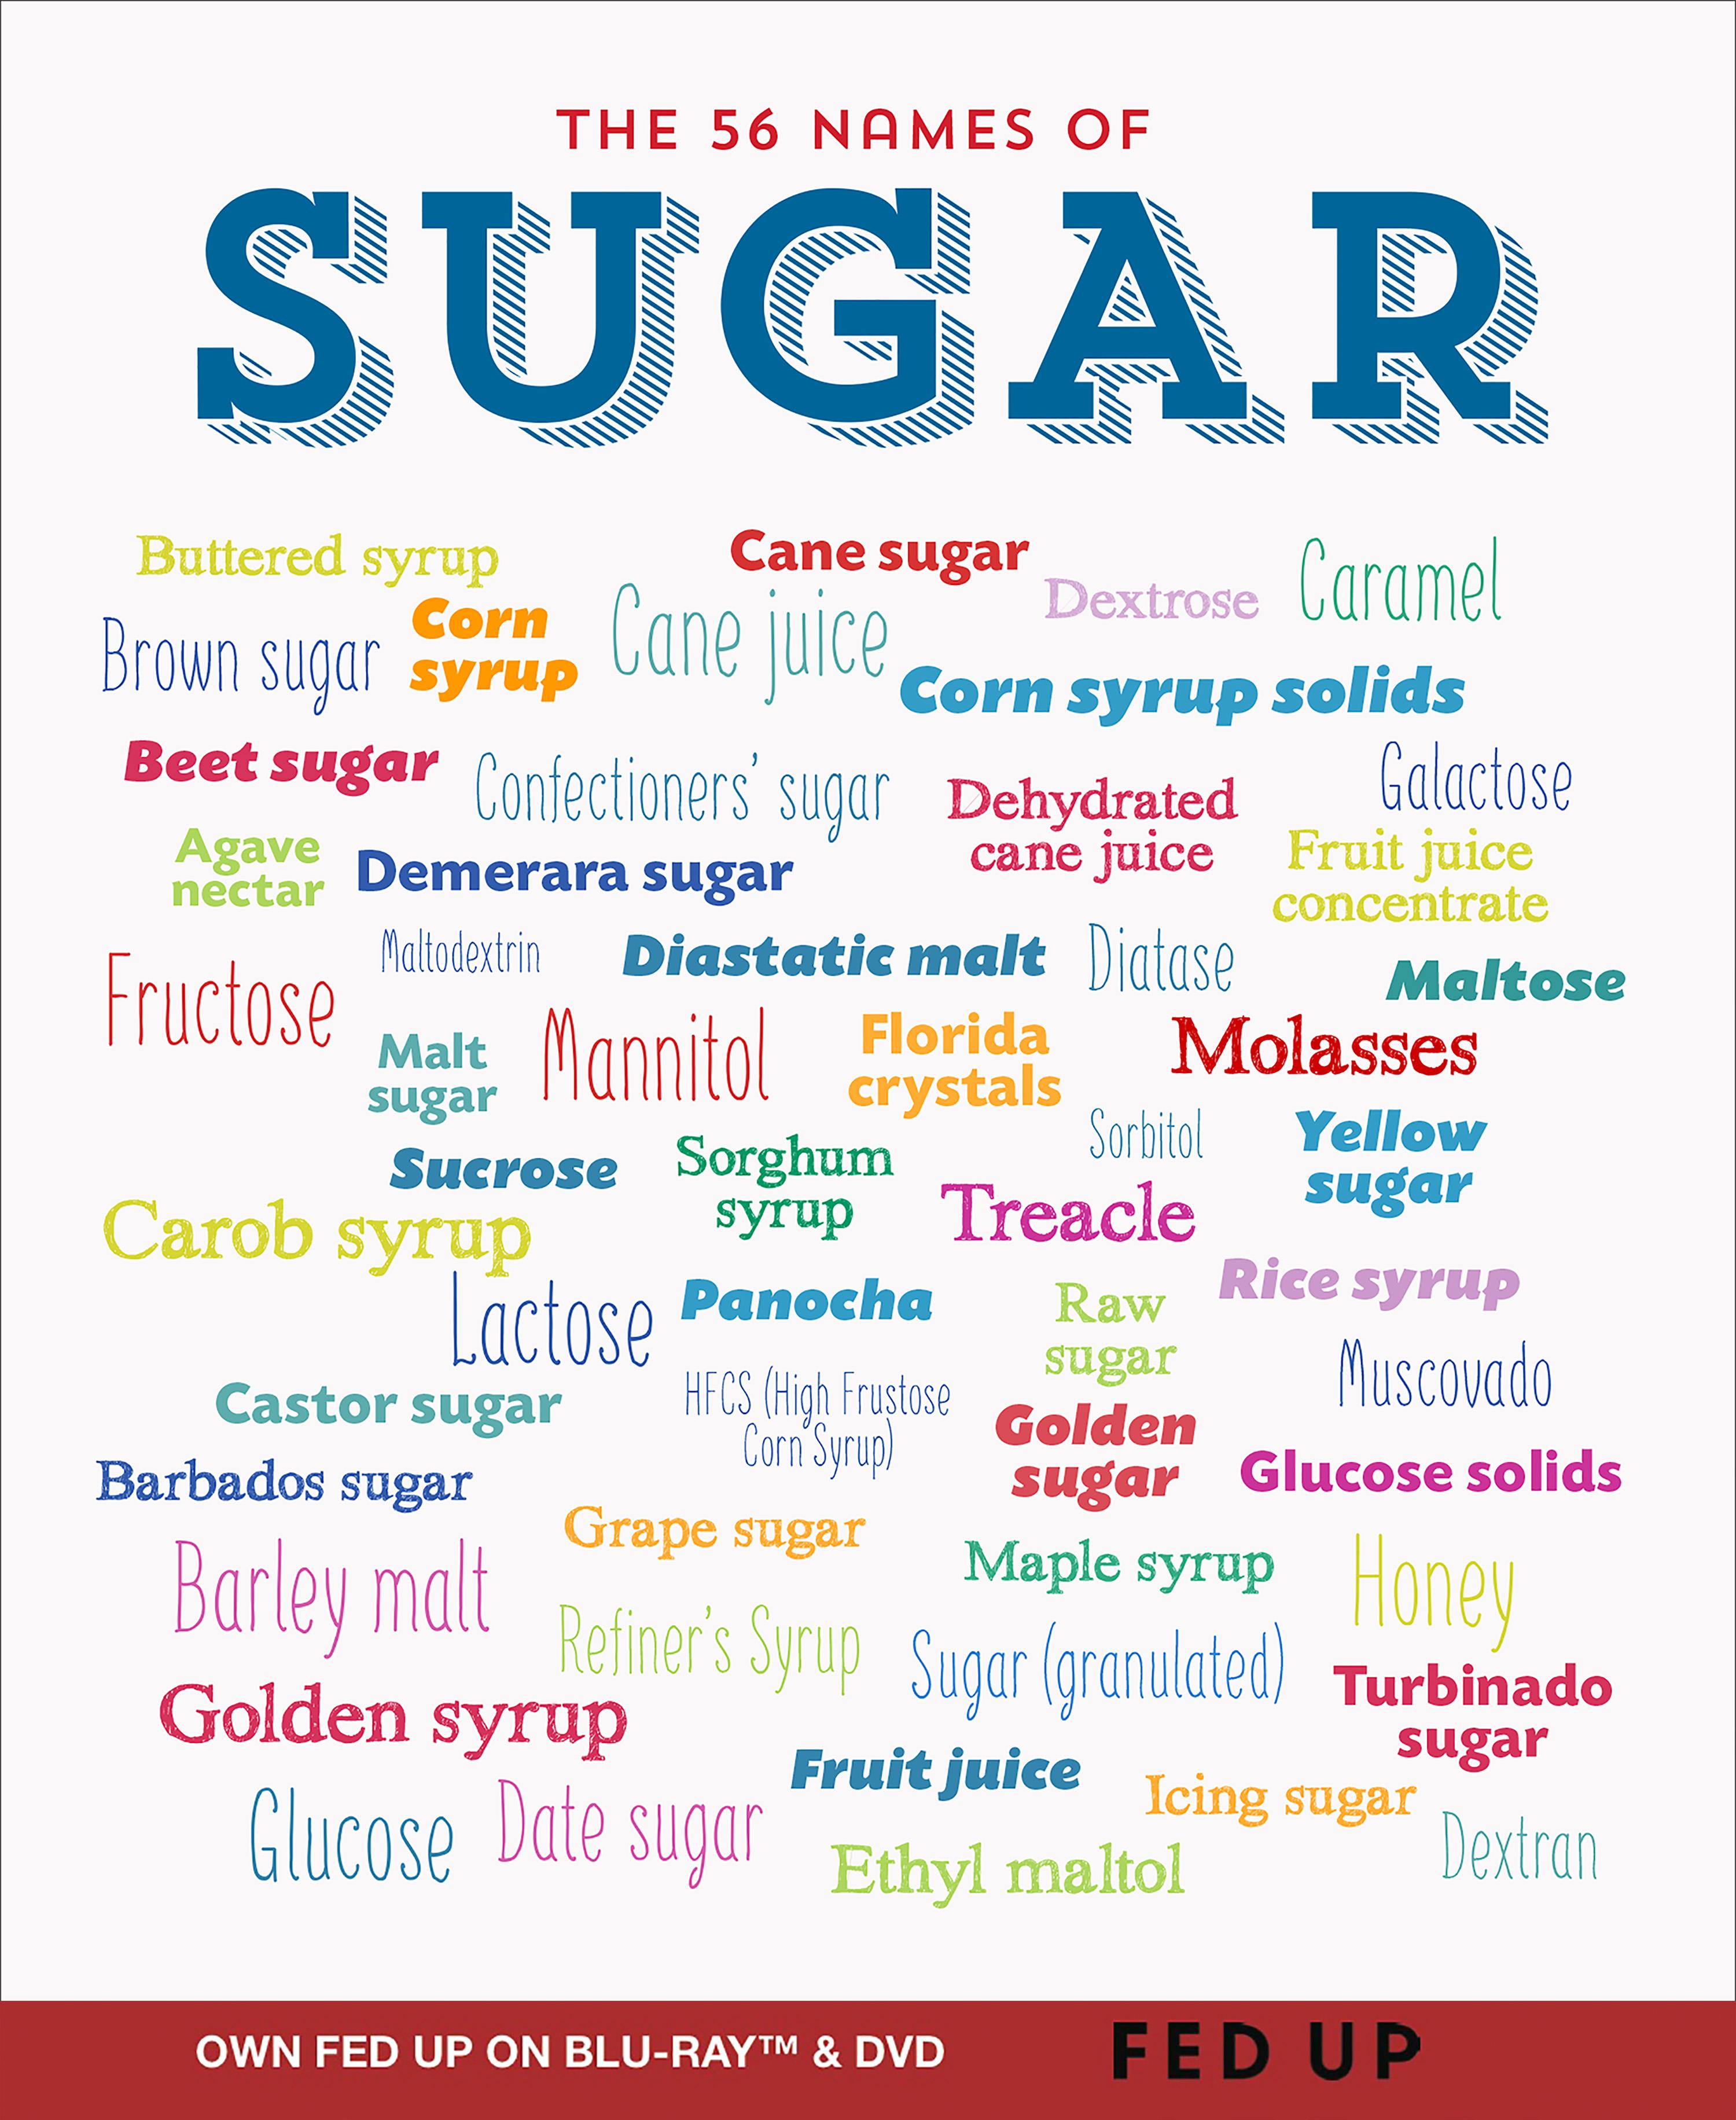 Maltose molasses is a dietary substitute for sugar